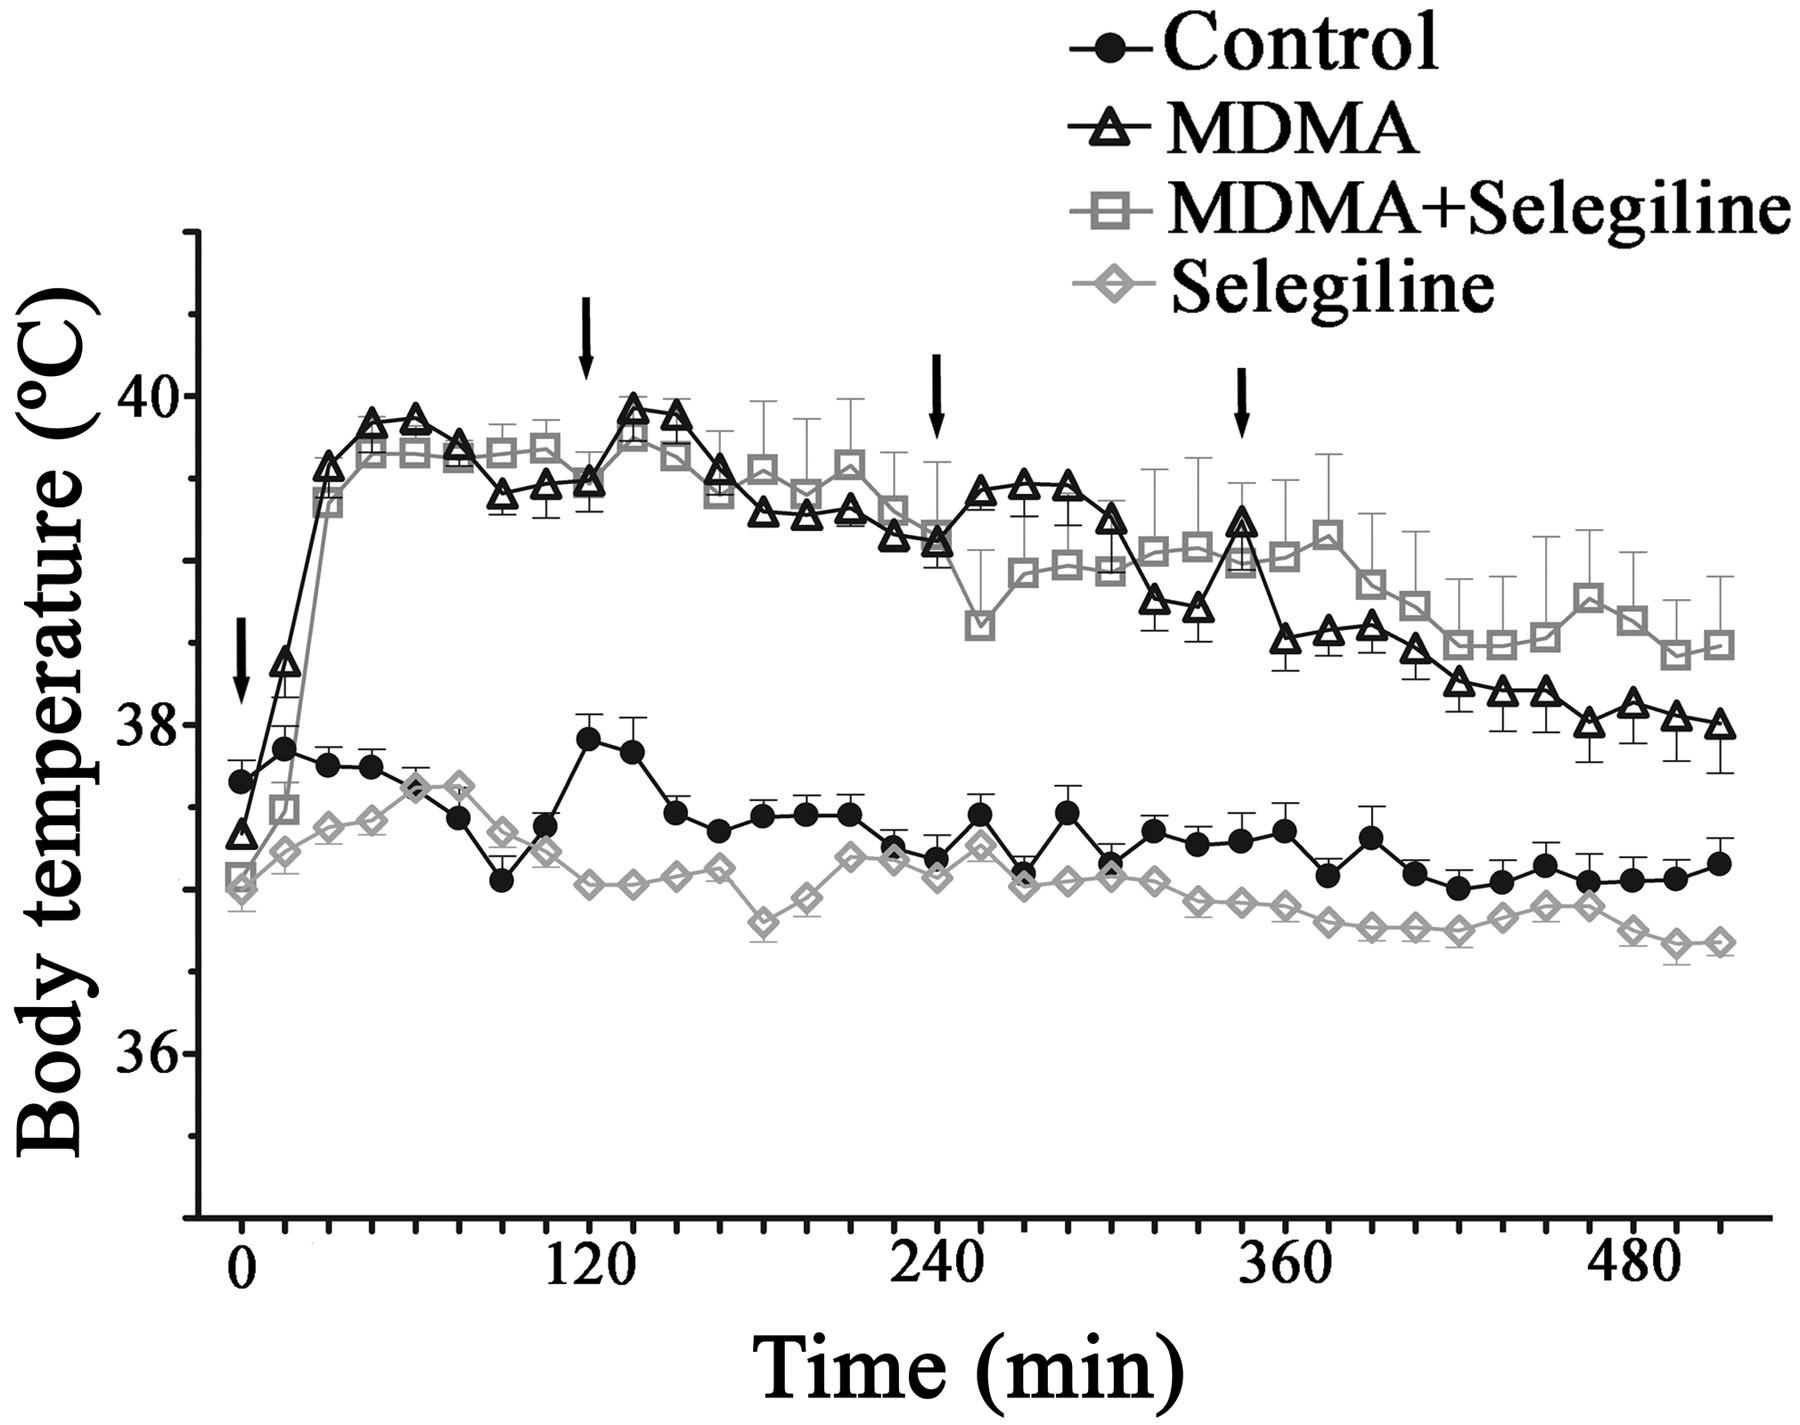 Monoamine Oxidase-B Mediates Ecstasy-Induced Neurotoxic Effects to